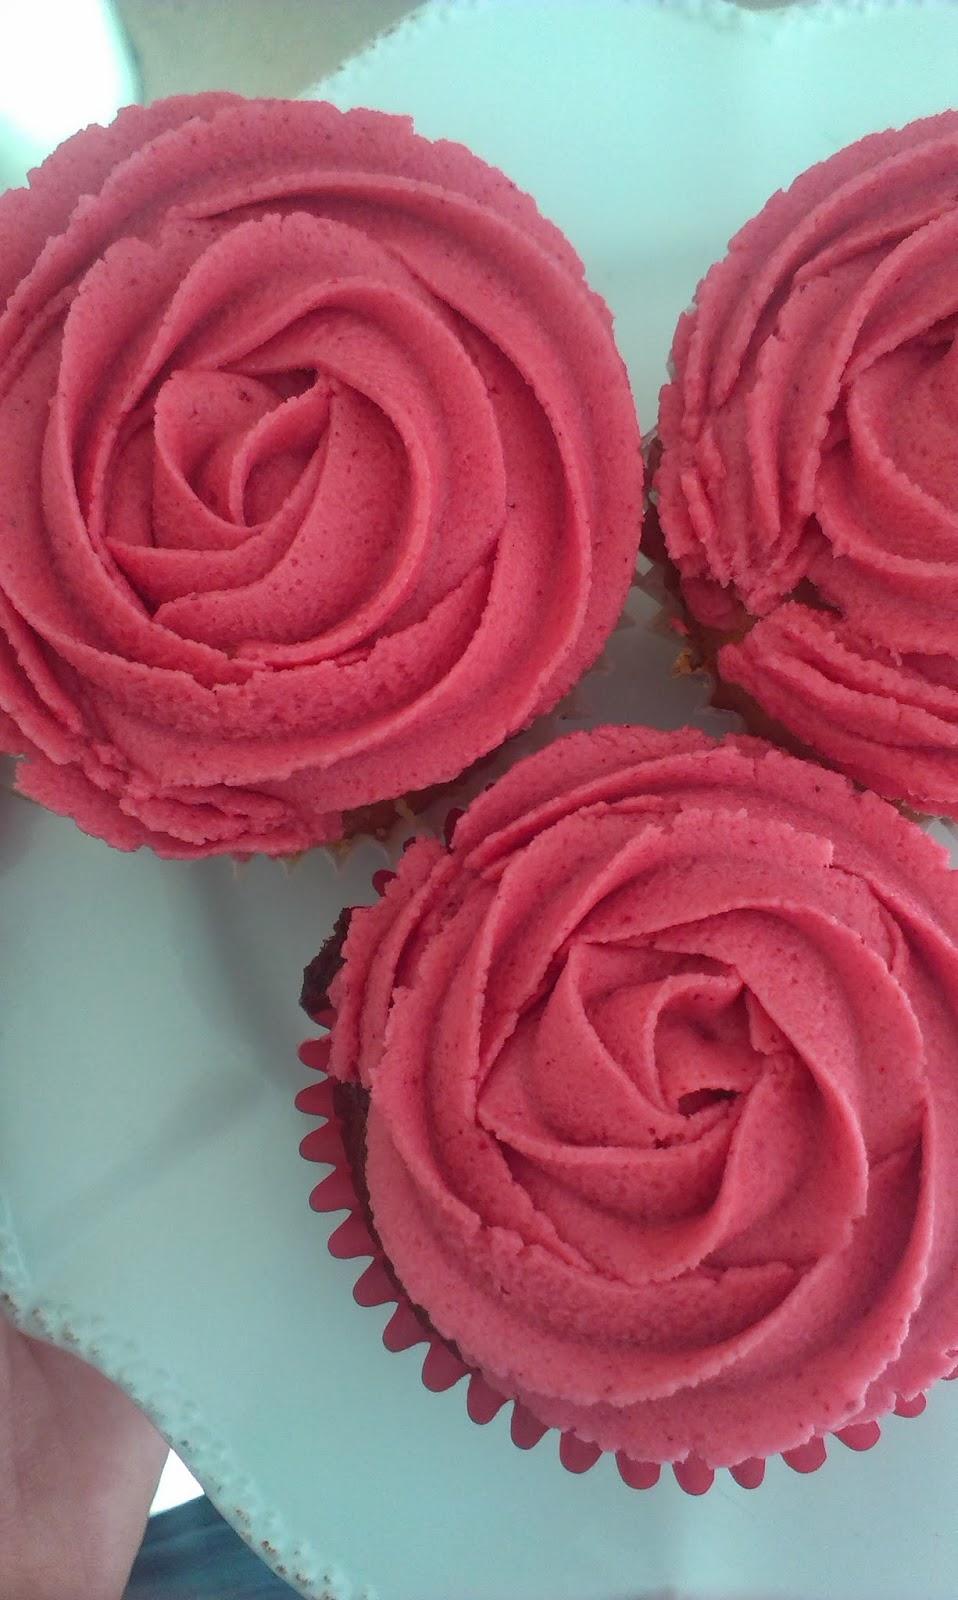 Plum and pistachio cake with citrus glaze | Kate Bakes Cupcakes